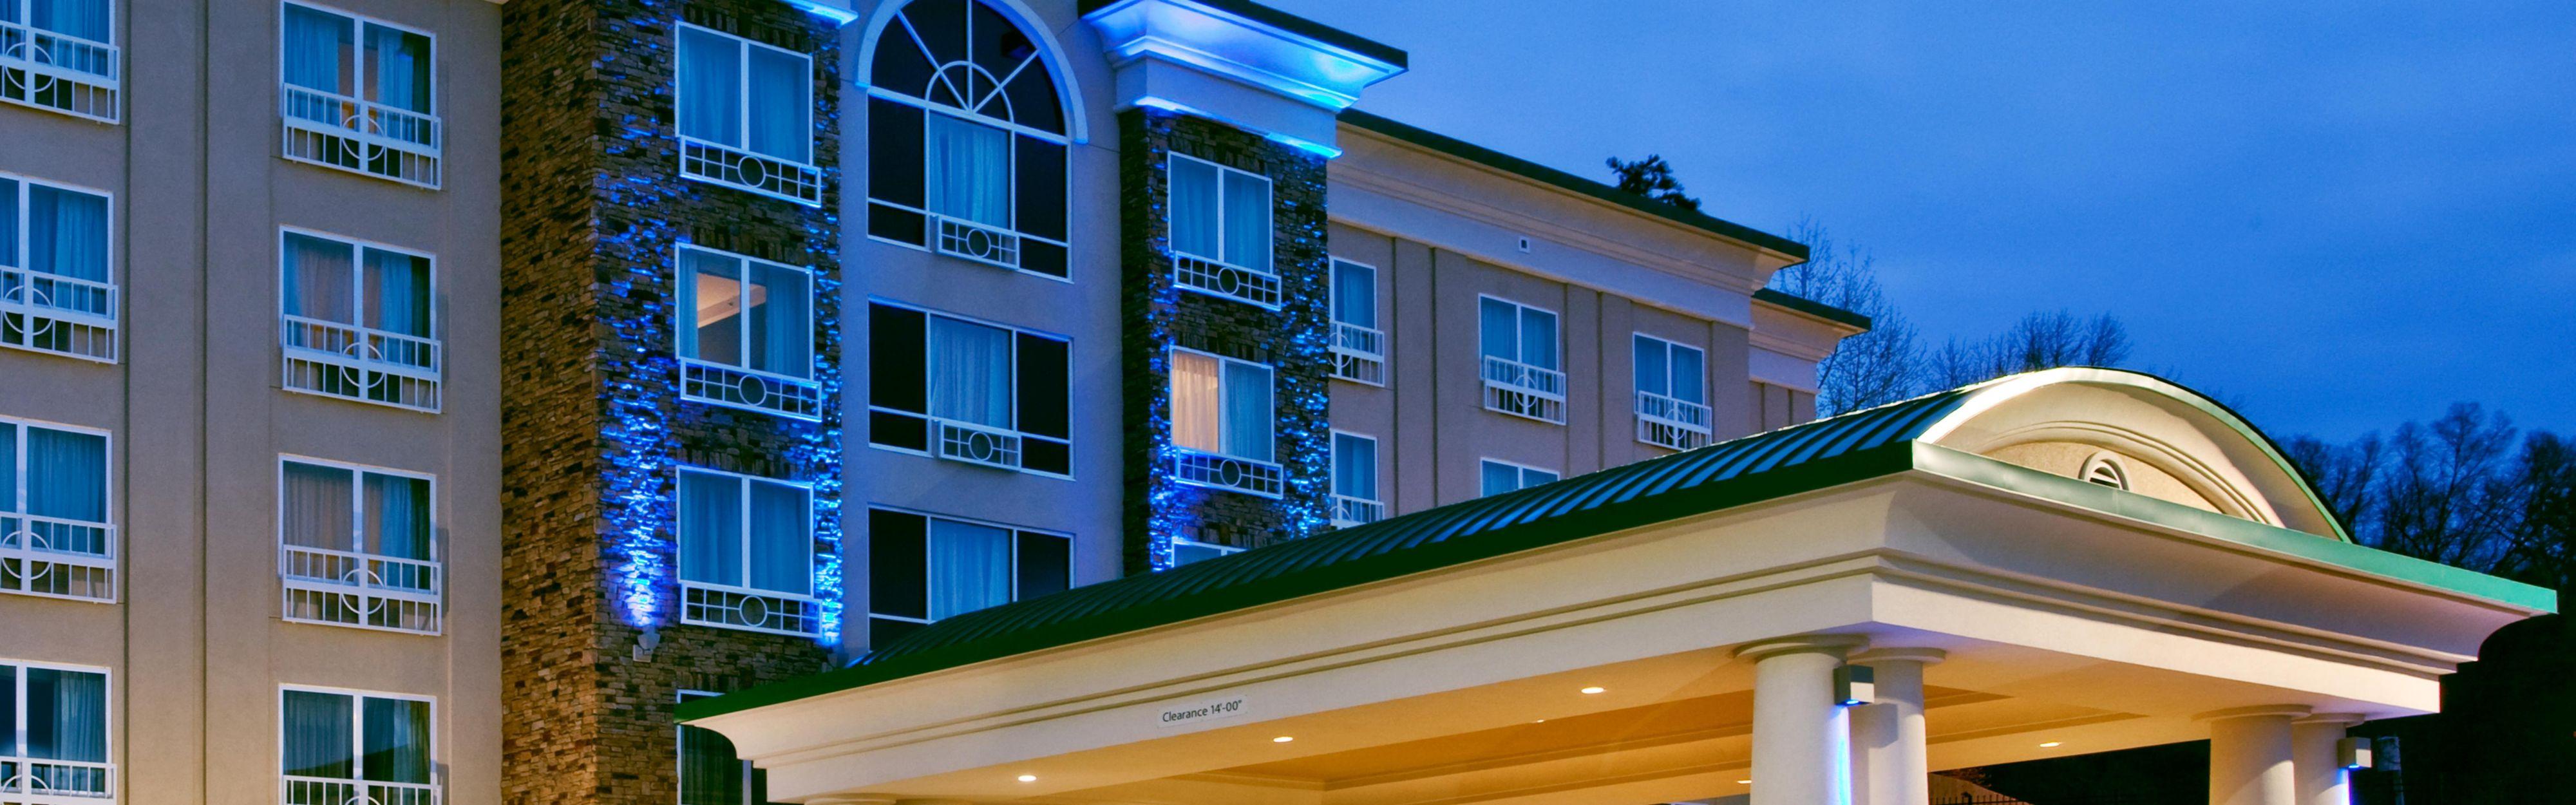 Hotels In Columbus Ga Near Ft Benning